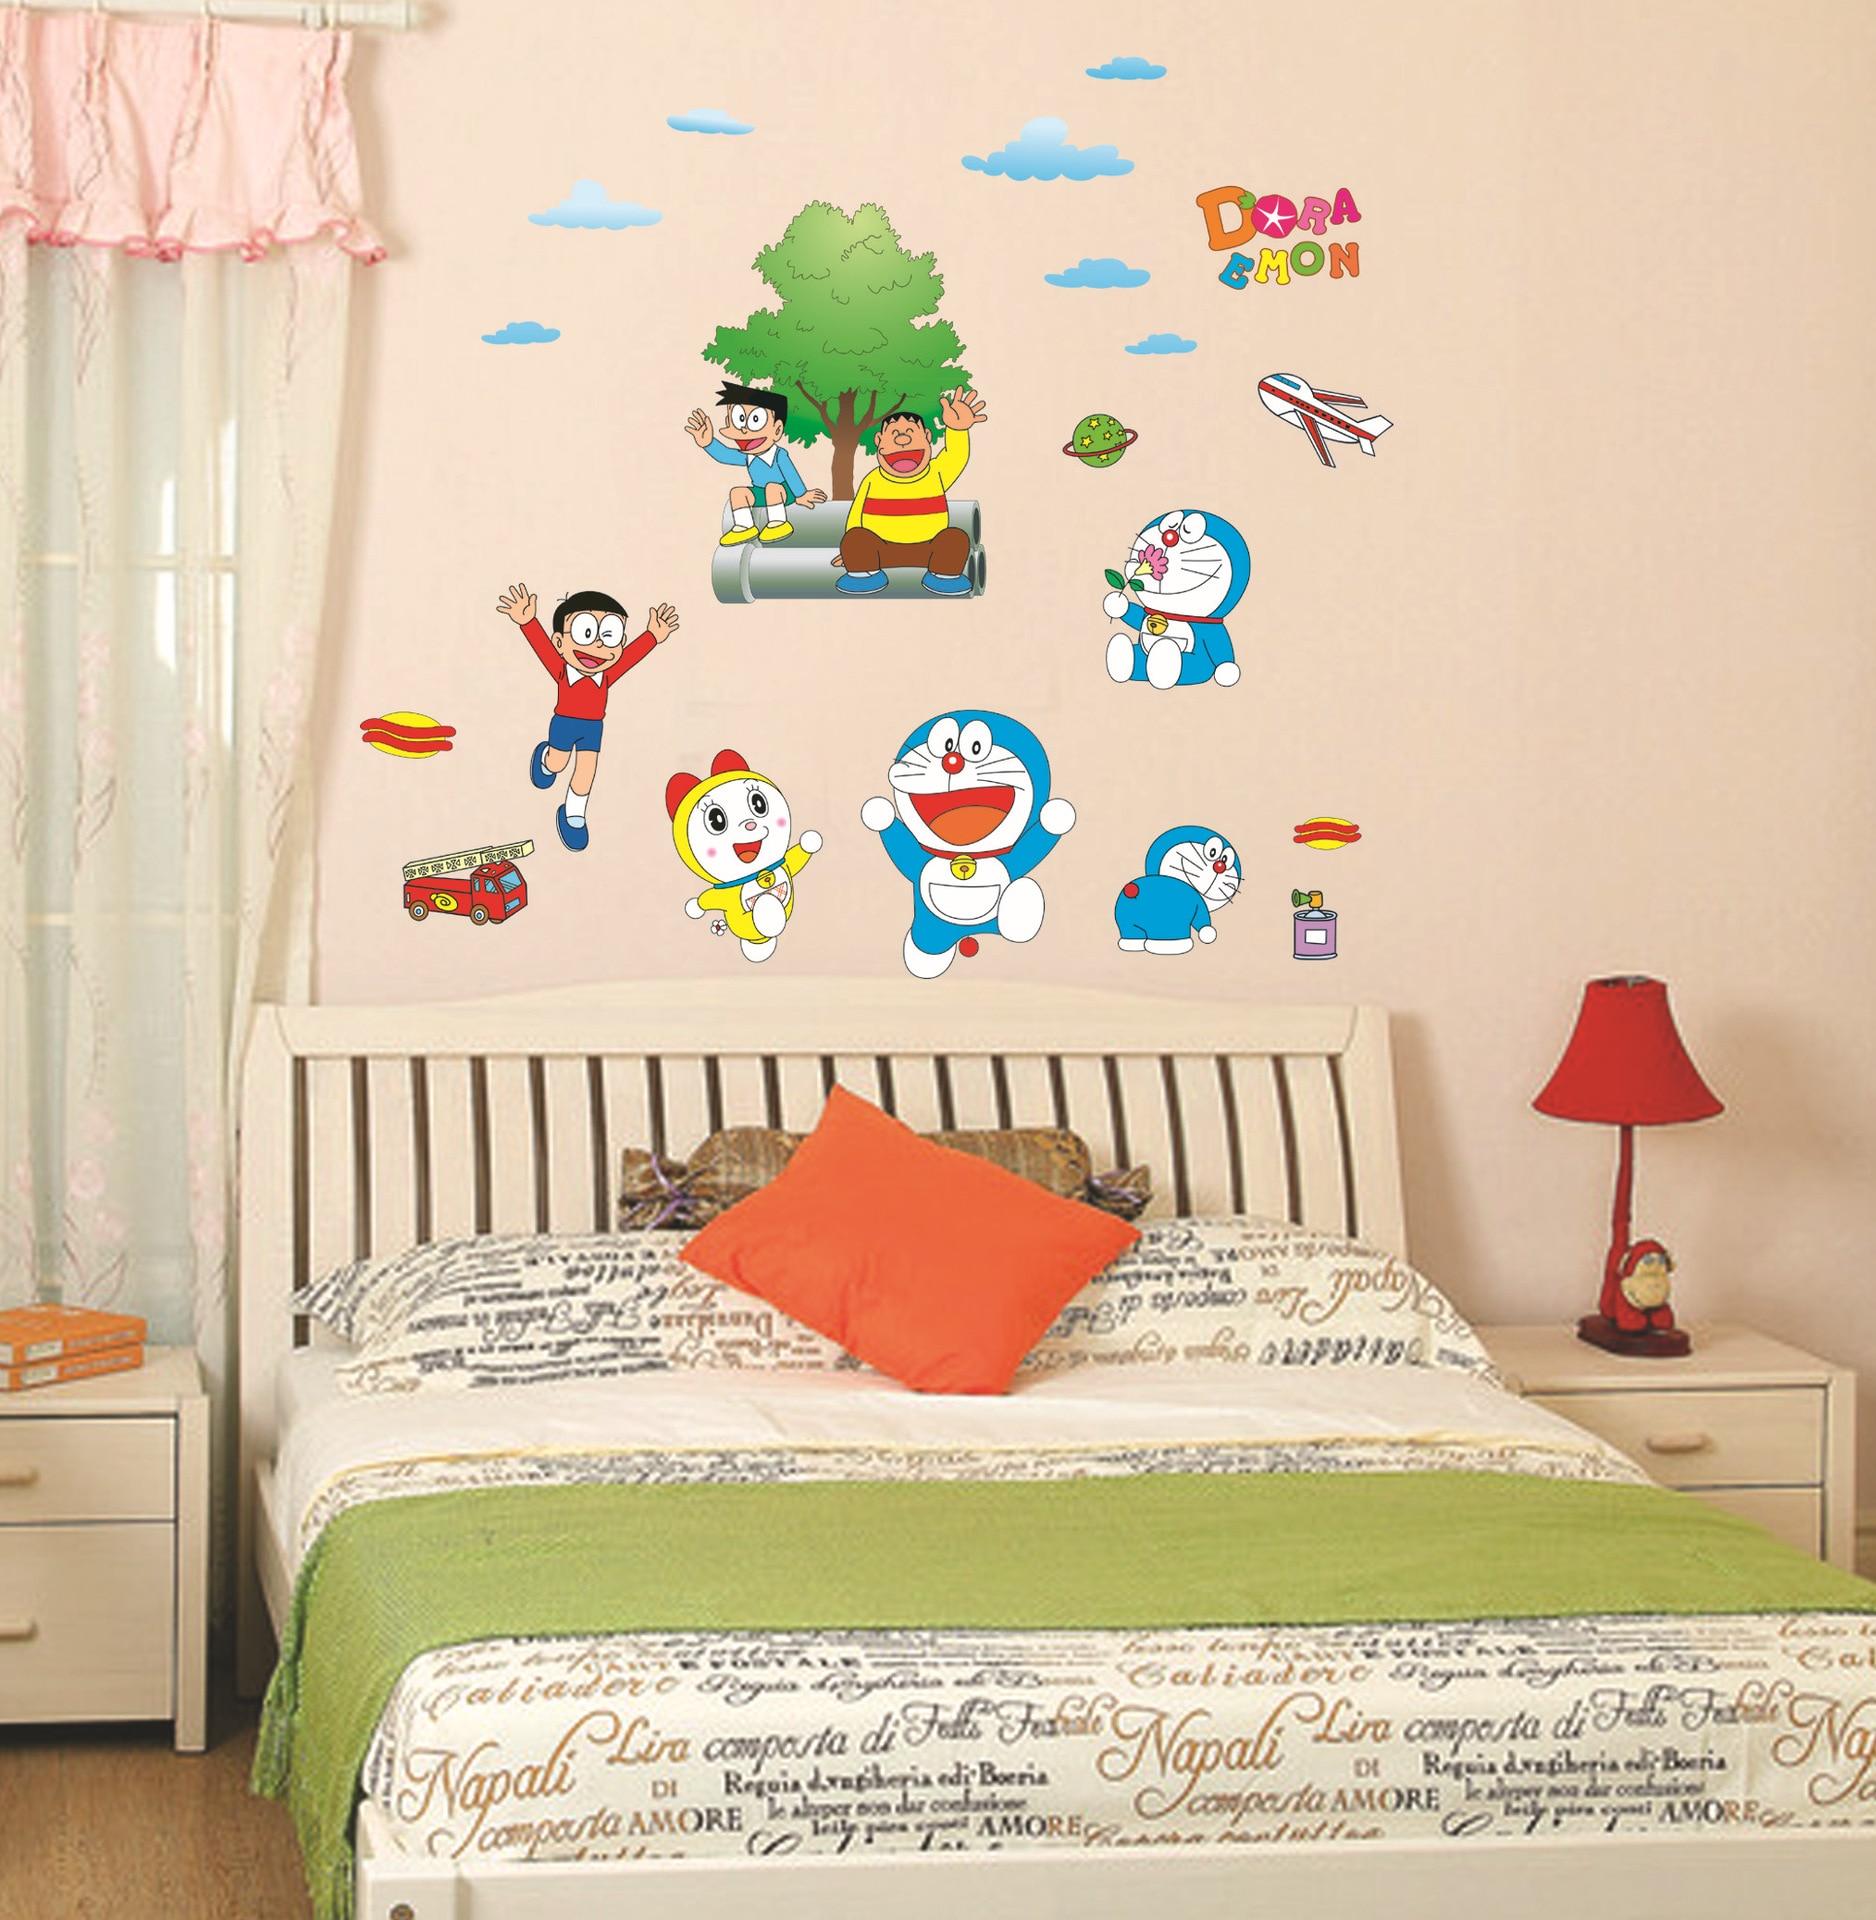 popular children room decoration doraemon stickers buy cheap diy doraemon removable 3d wall stickers kids boy room cartoon children bedroom adesivo de parede culorful